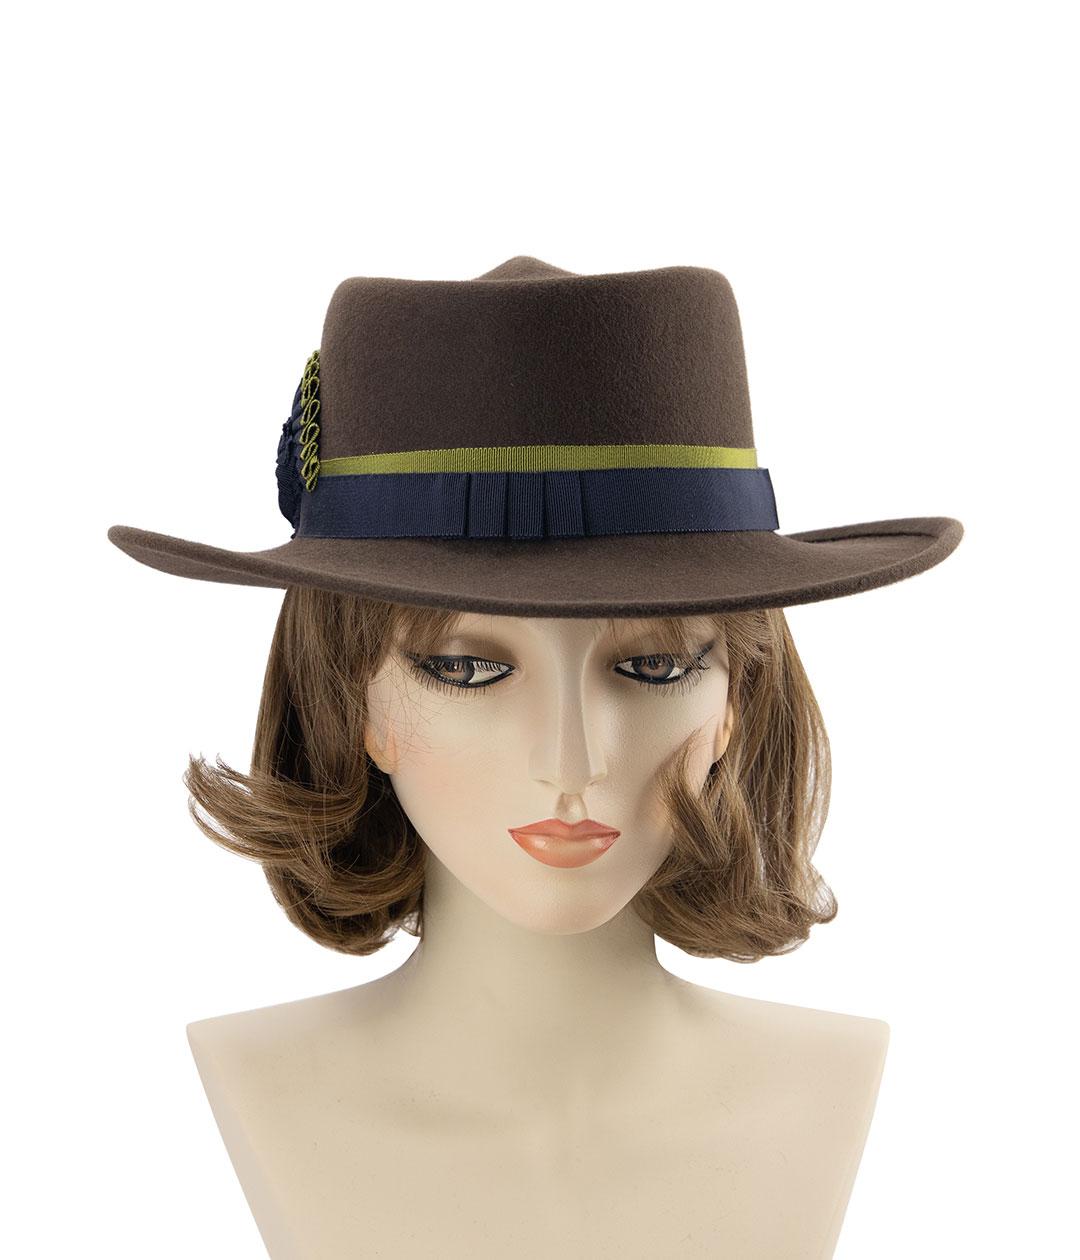 Women's cowboy hat. Brown Western hat front view on mannequin head.